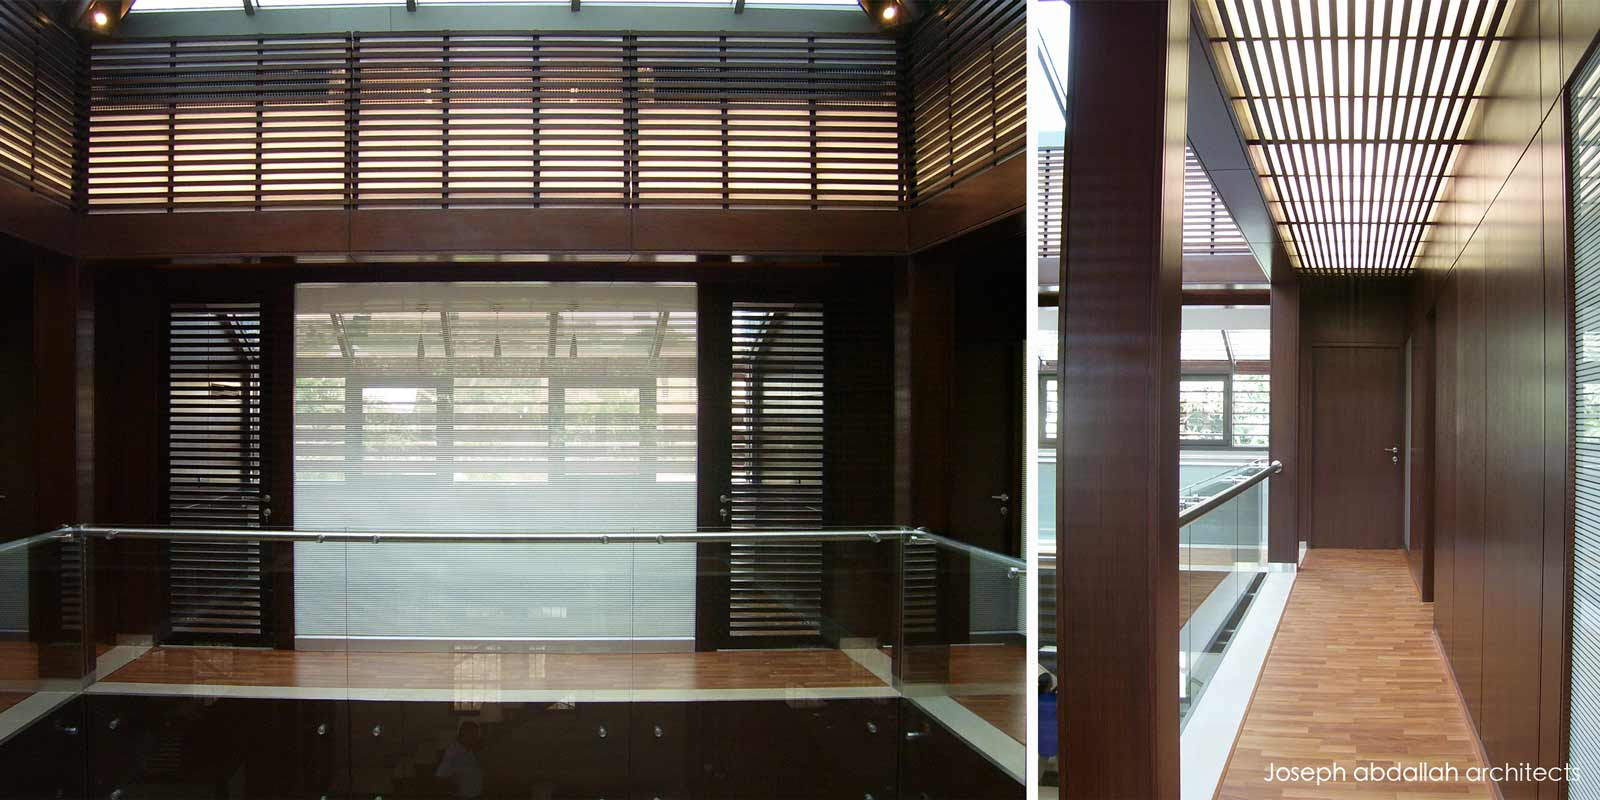 bank-lcb-sgbl-apotres-restoration-architecture-joseph-abdallah-architects-17